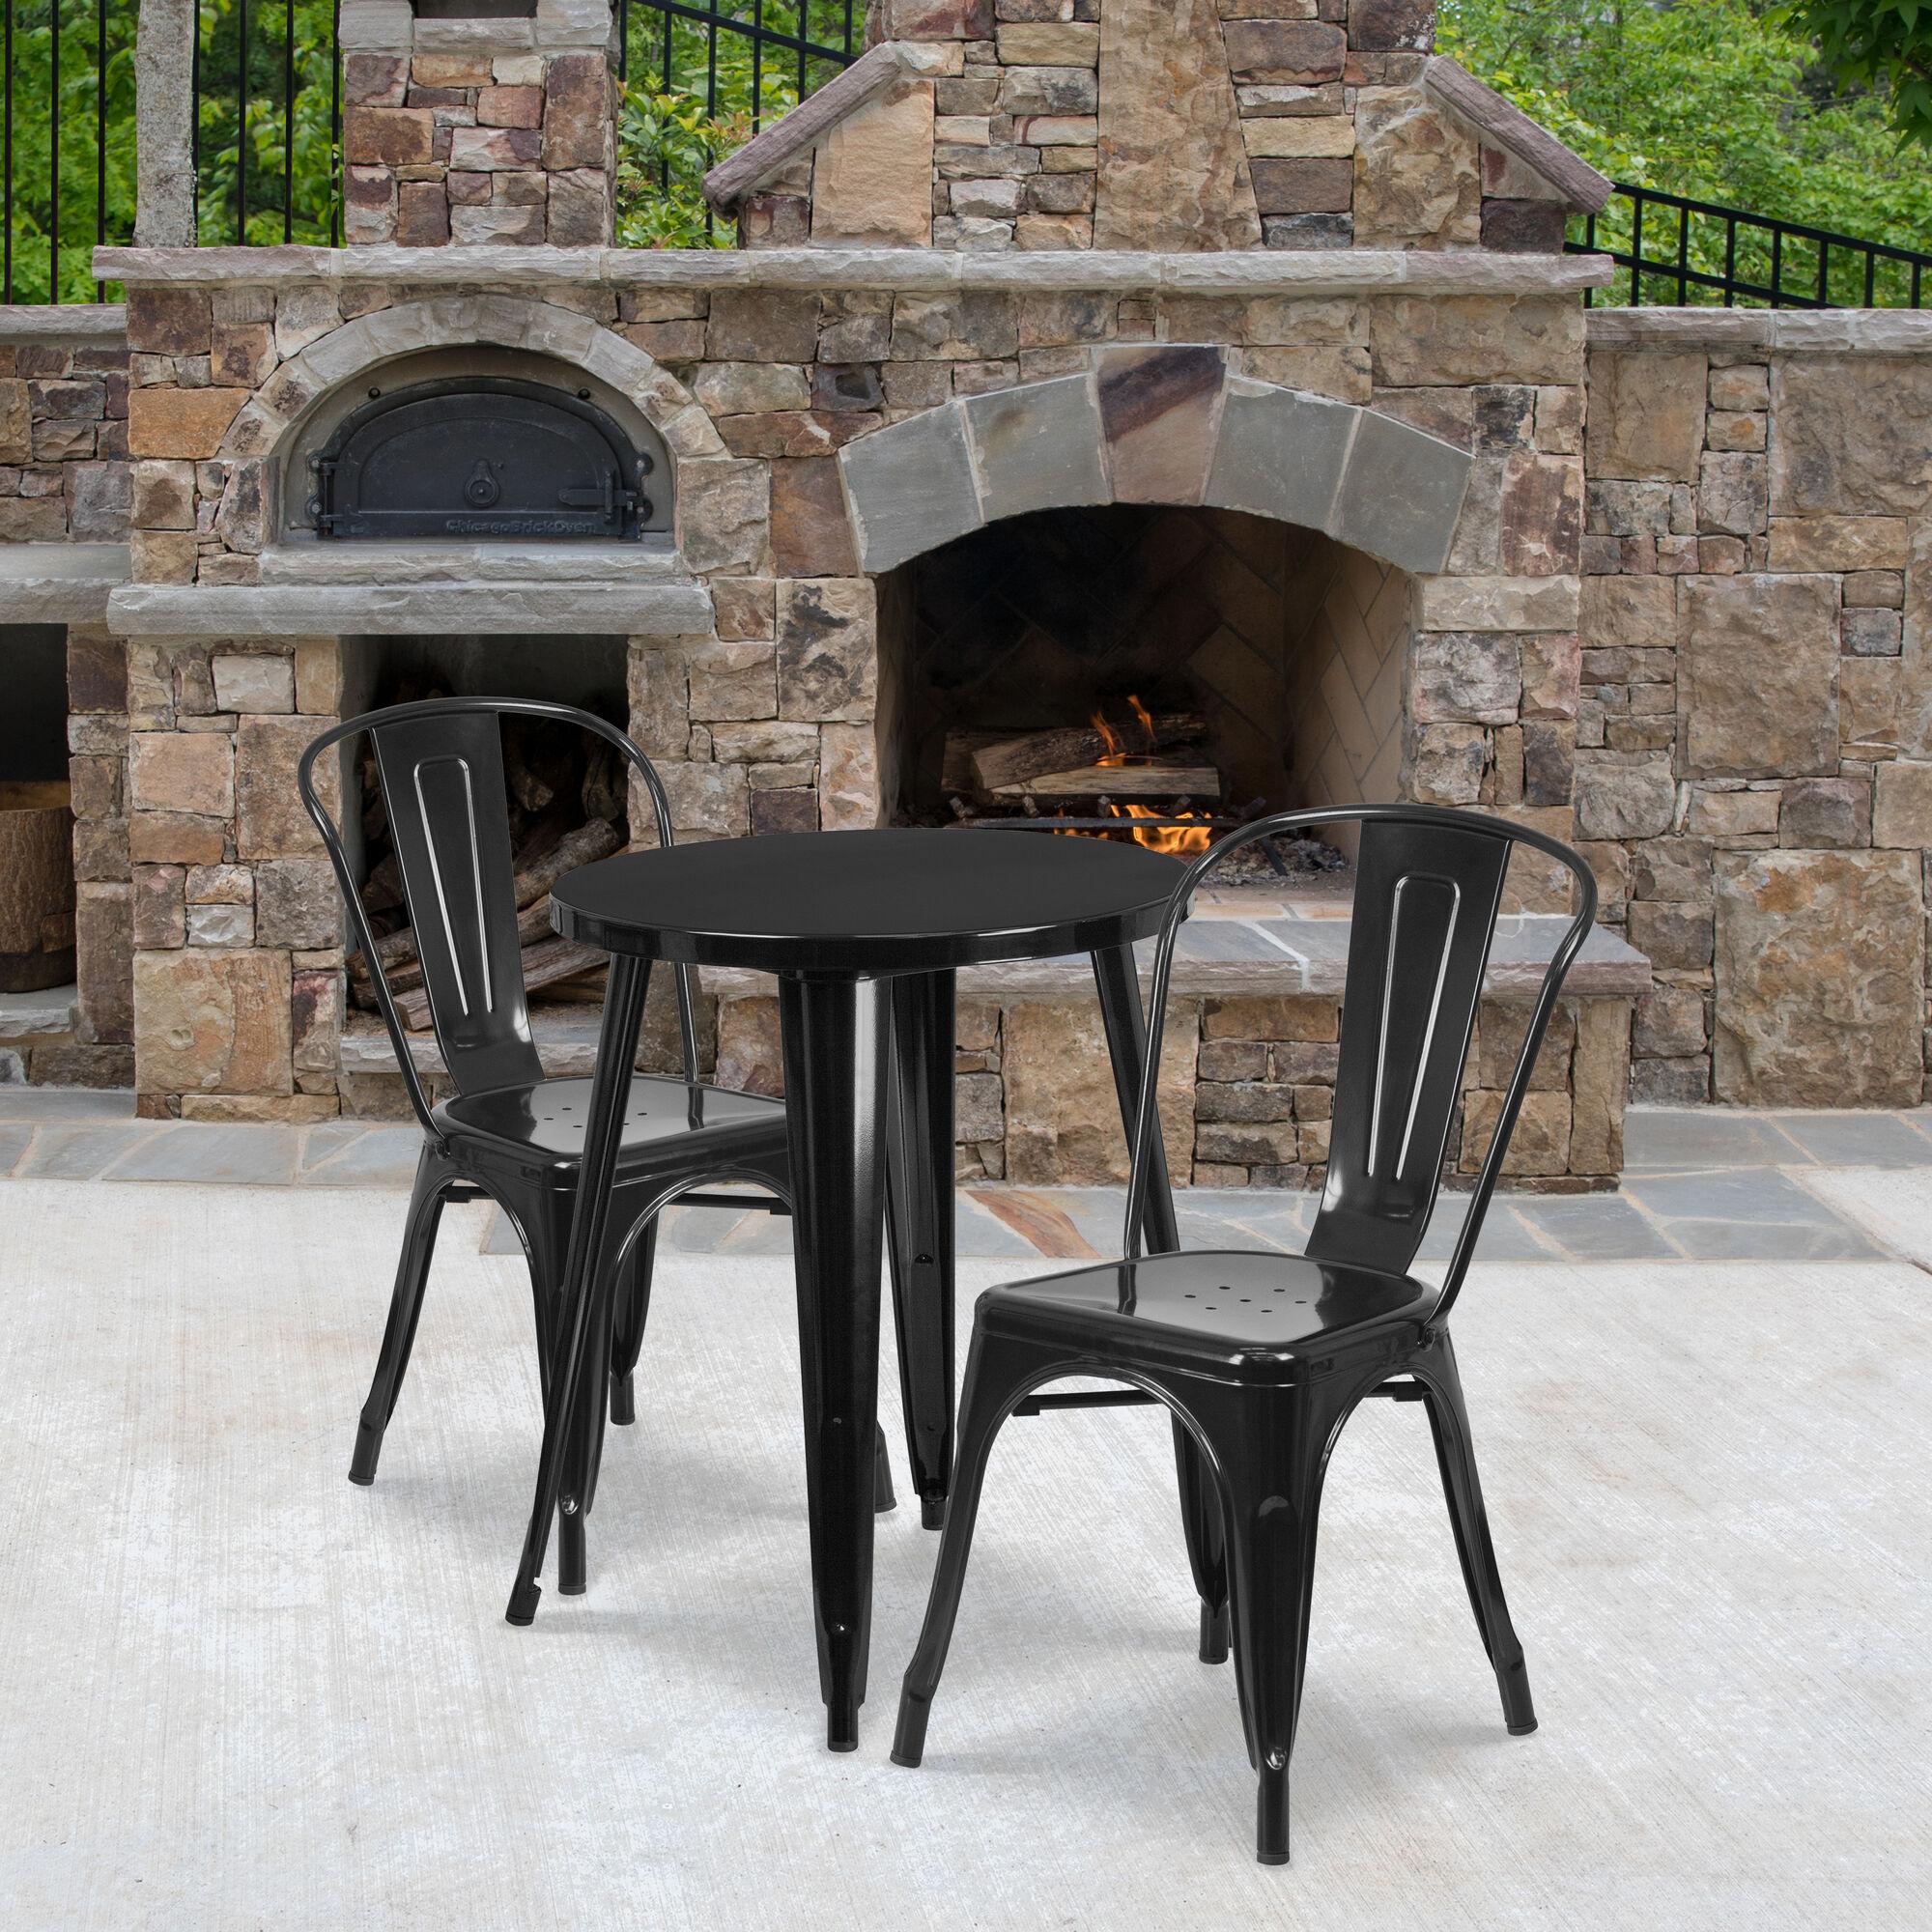 24rd Black Metal Table Set Ch 51080th 2 18cafe Bk Gg Restaurantfurniture4less Com